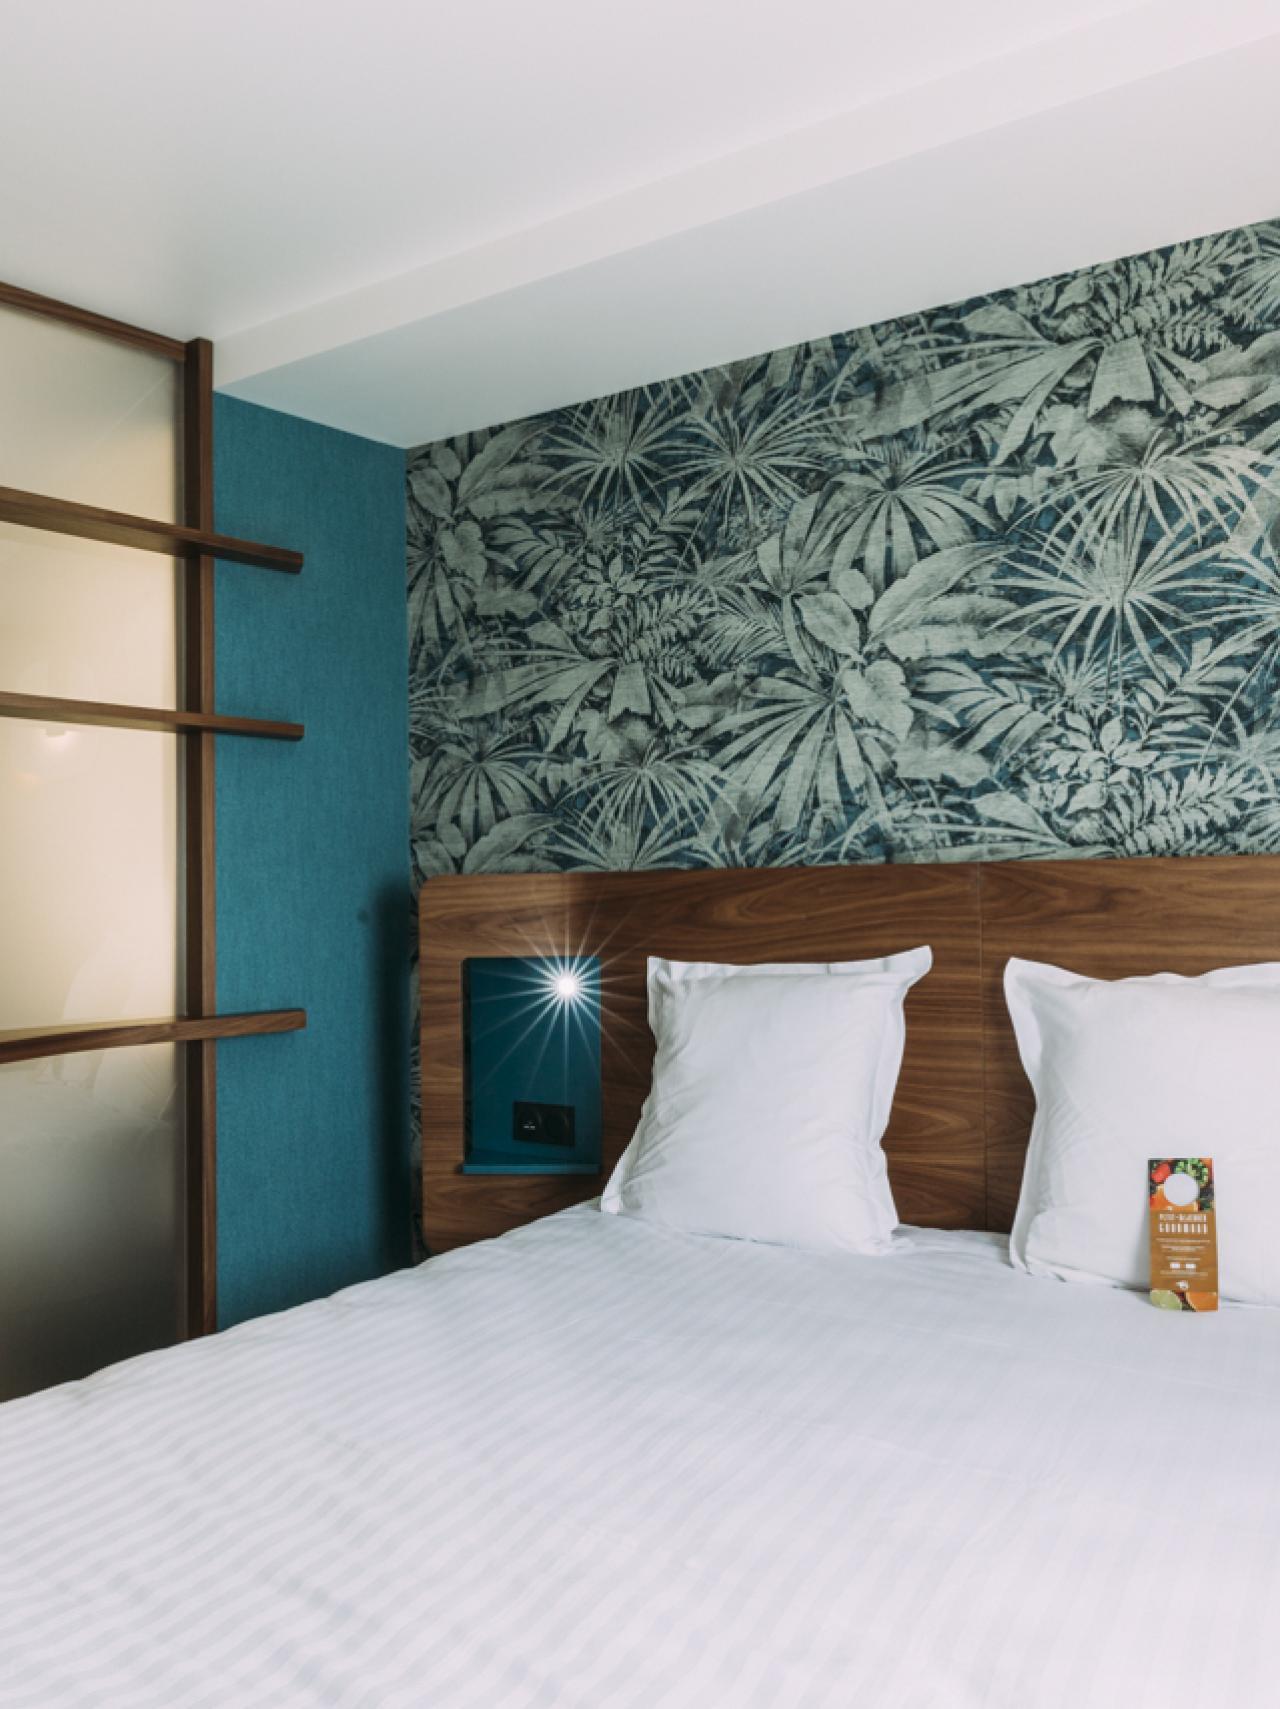 Hotel Oceania Paris pte de Versailles 4 star - New Room